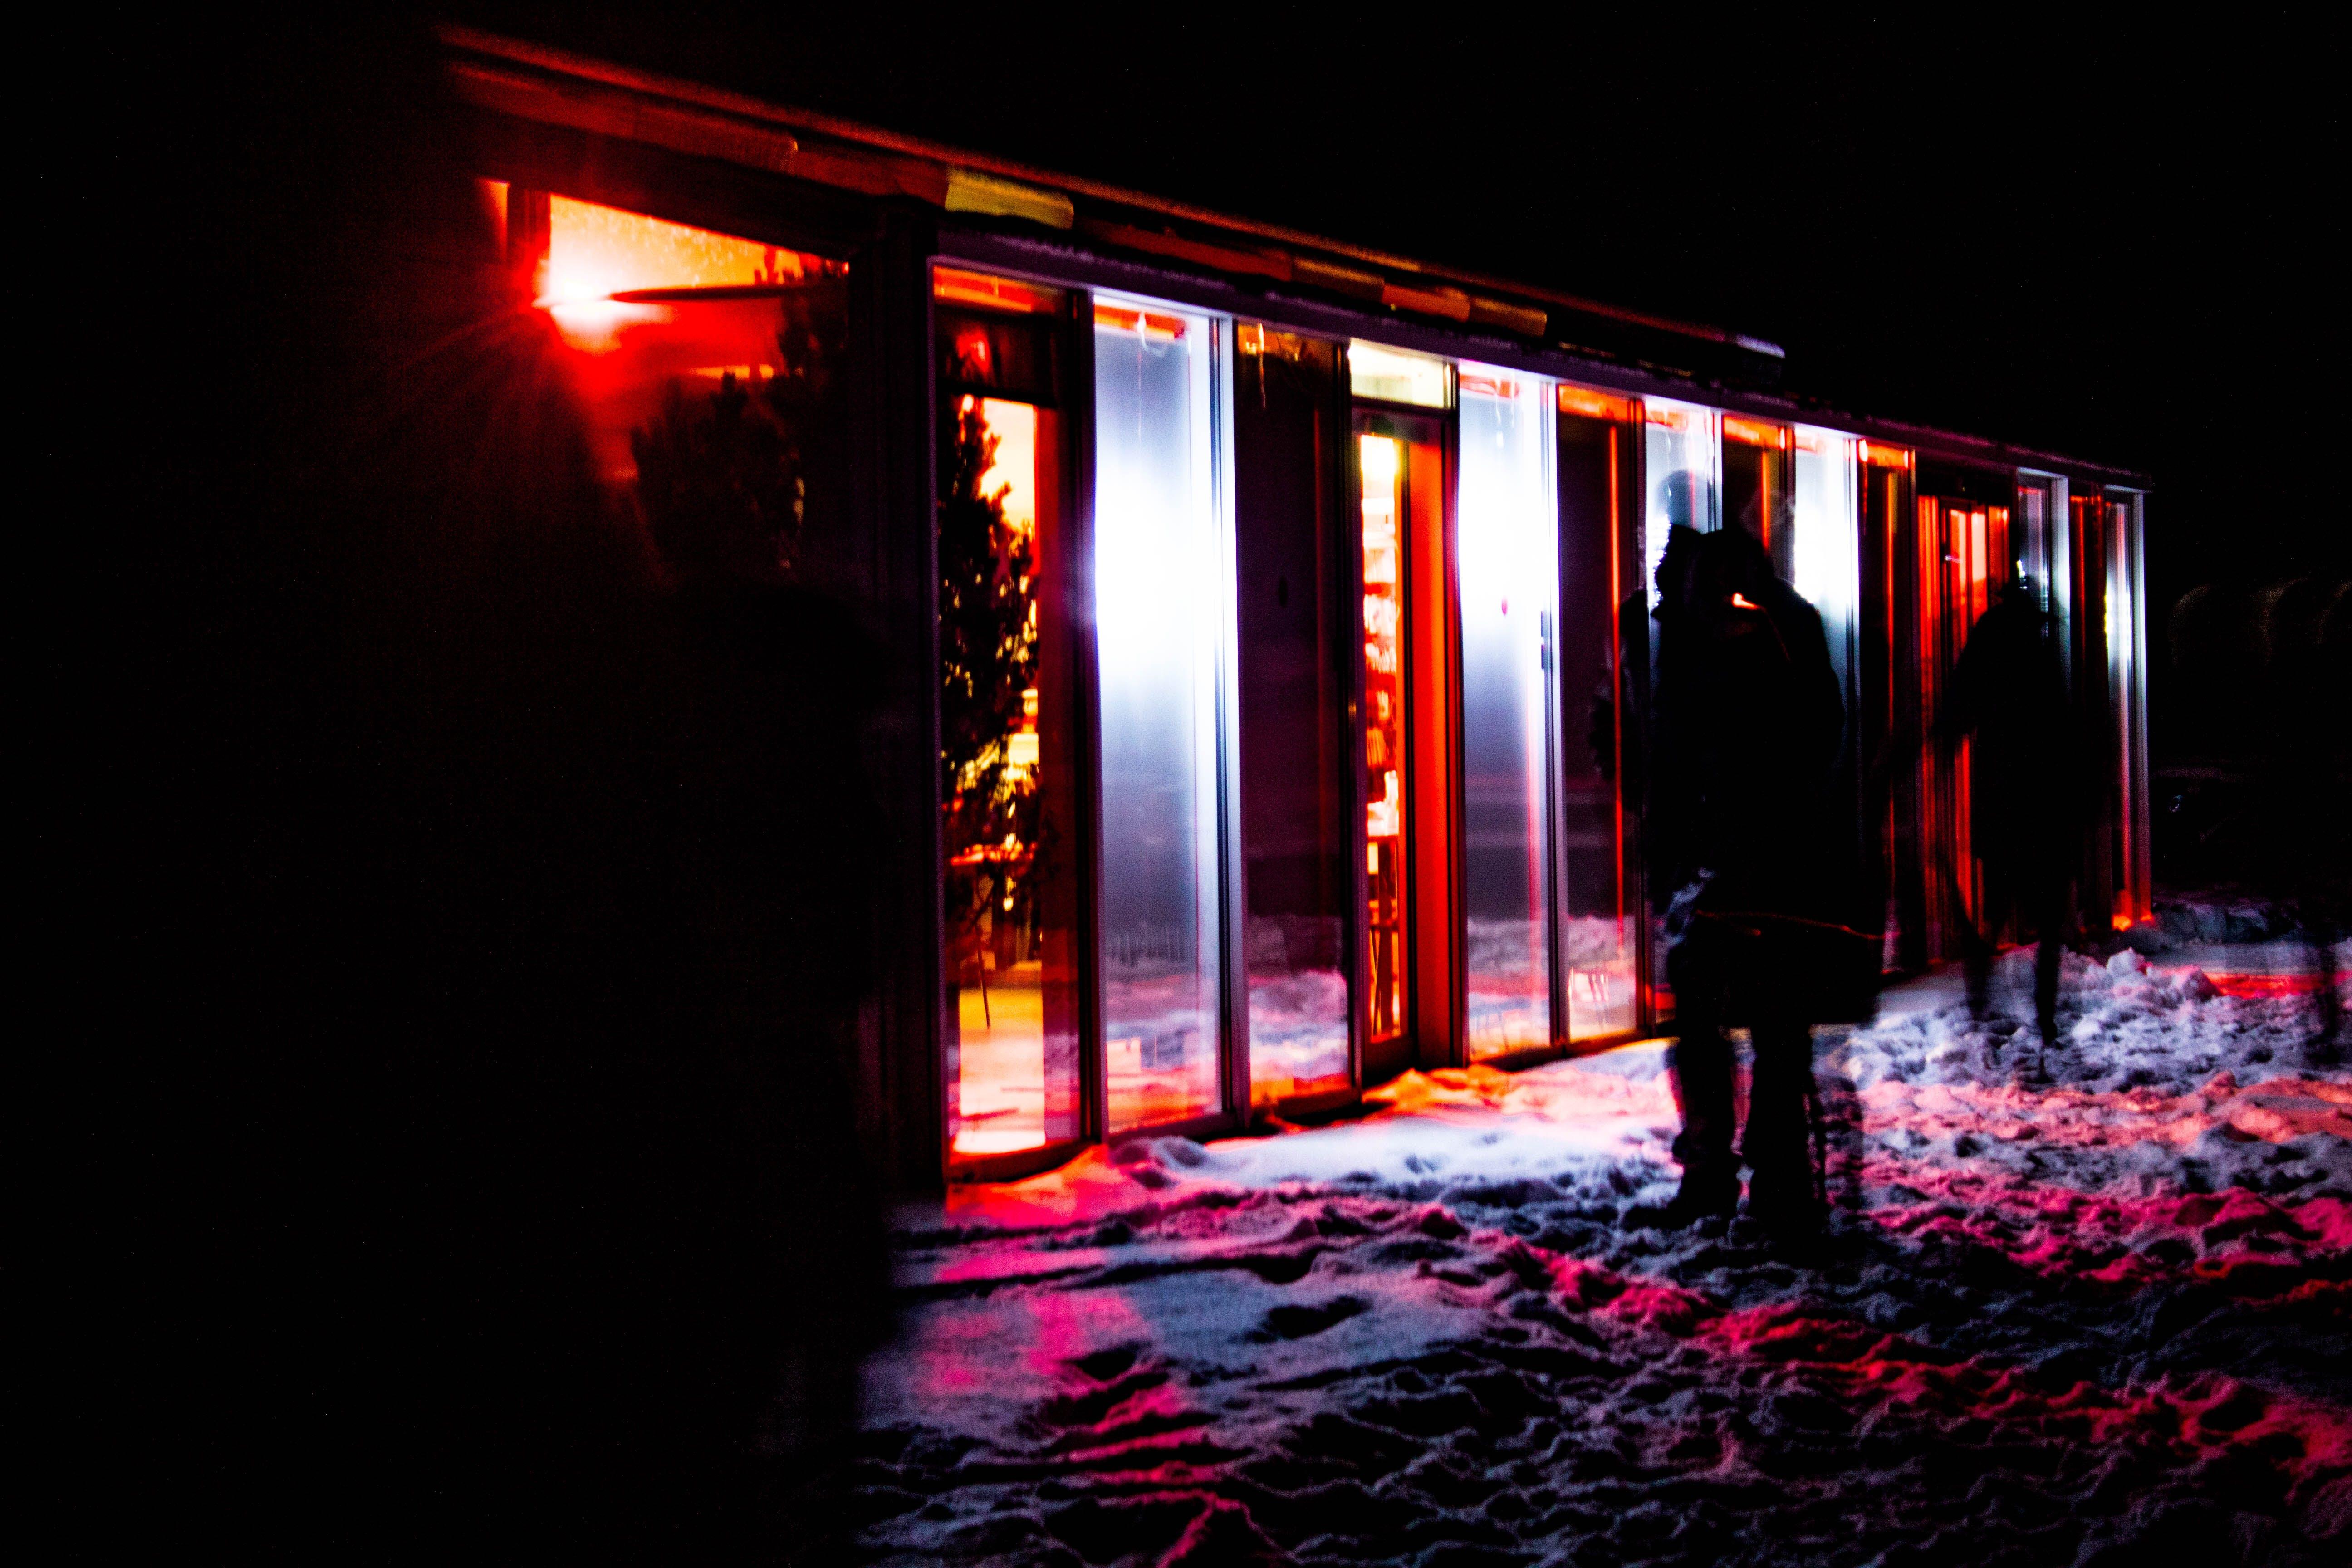 Kostenloses Stock Foto zu abbildung, abend, beleuchtet, beleuchtung